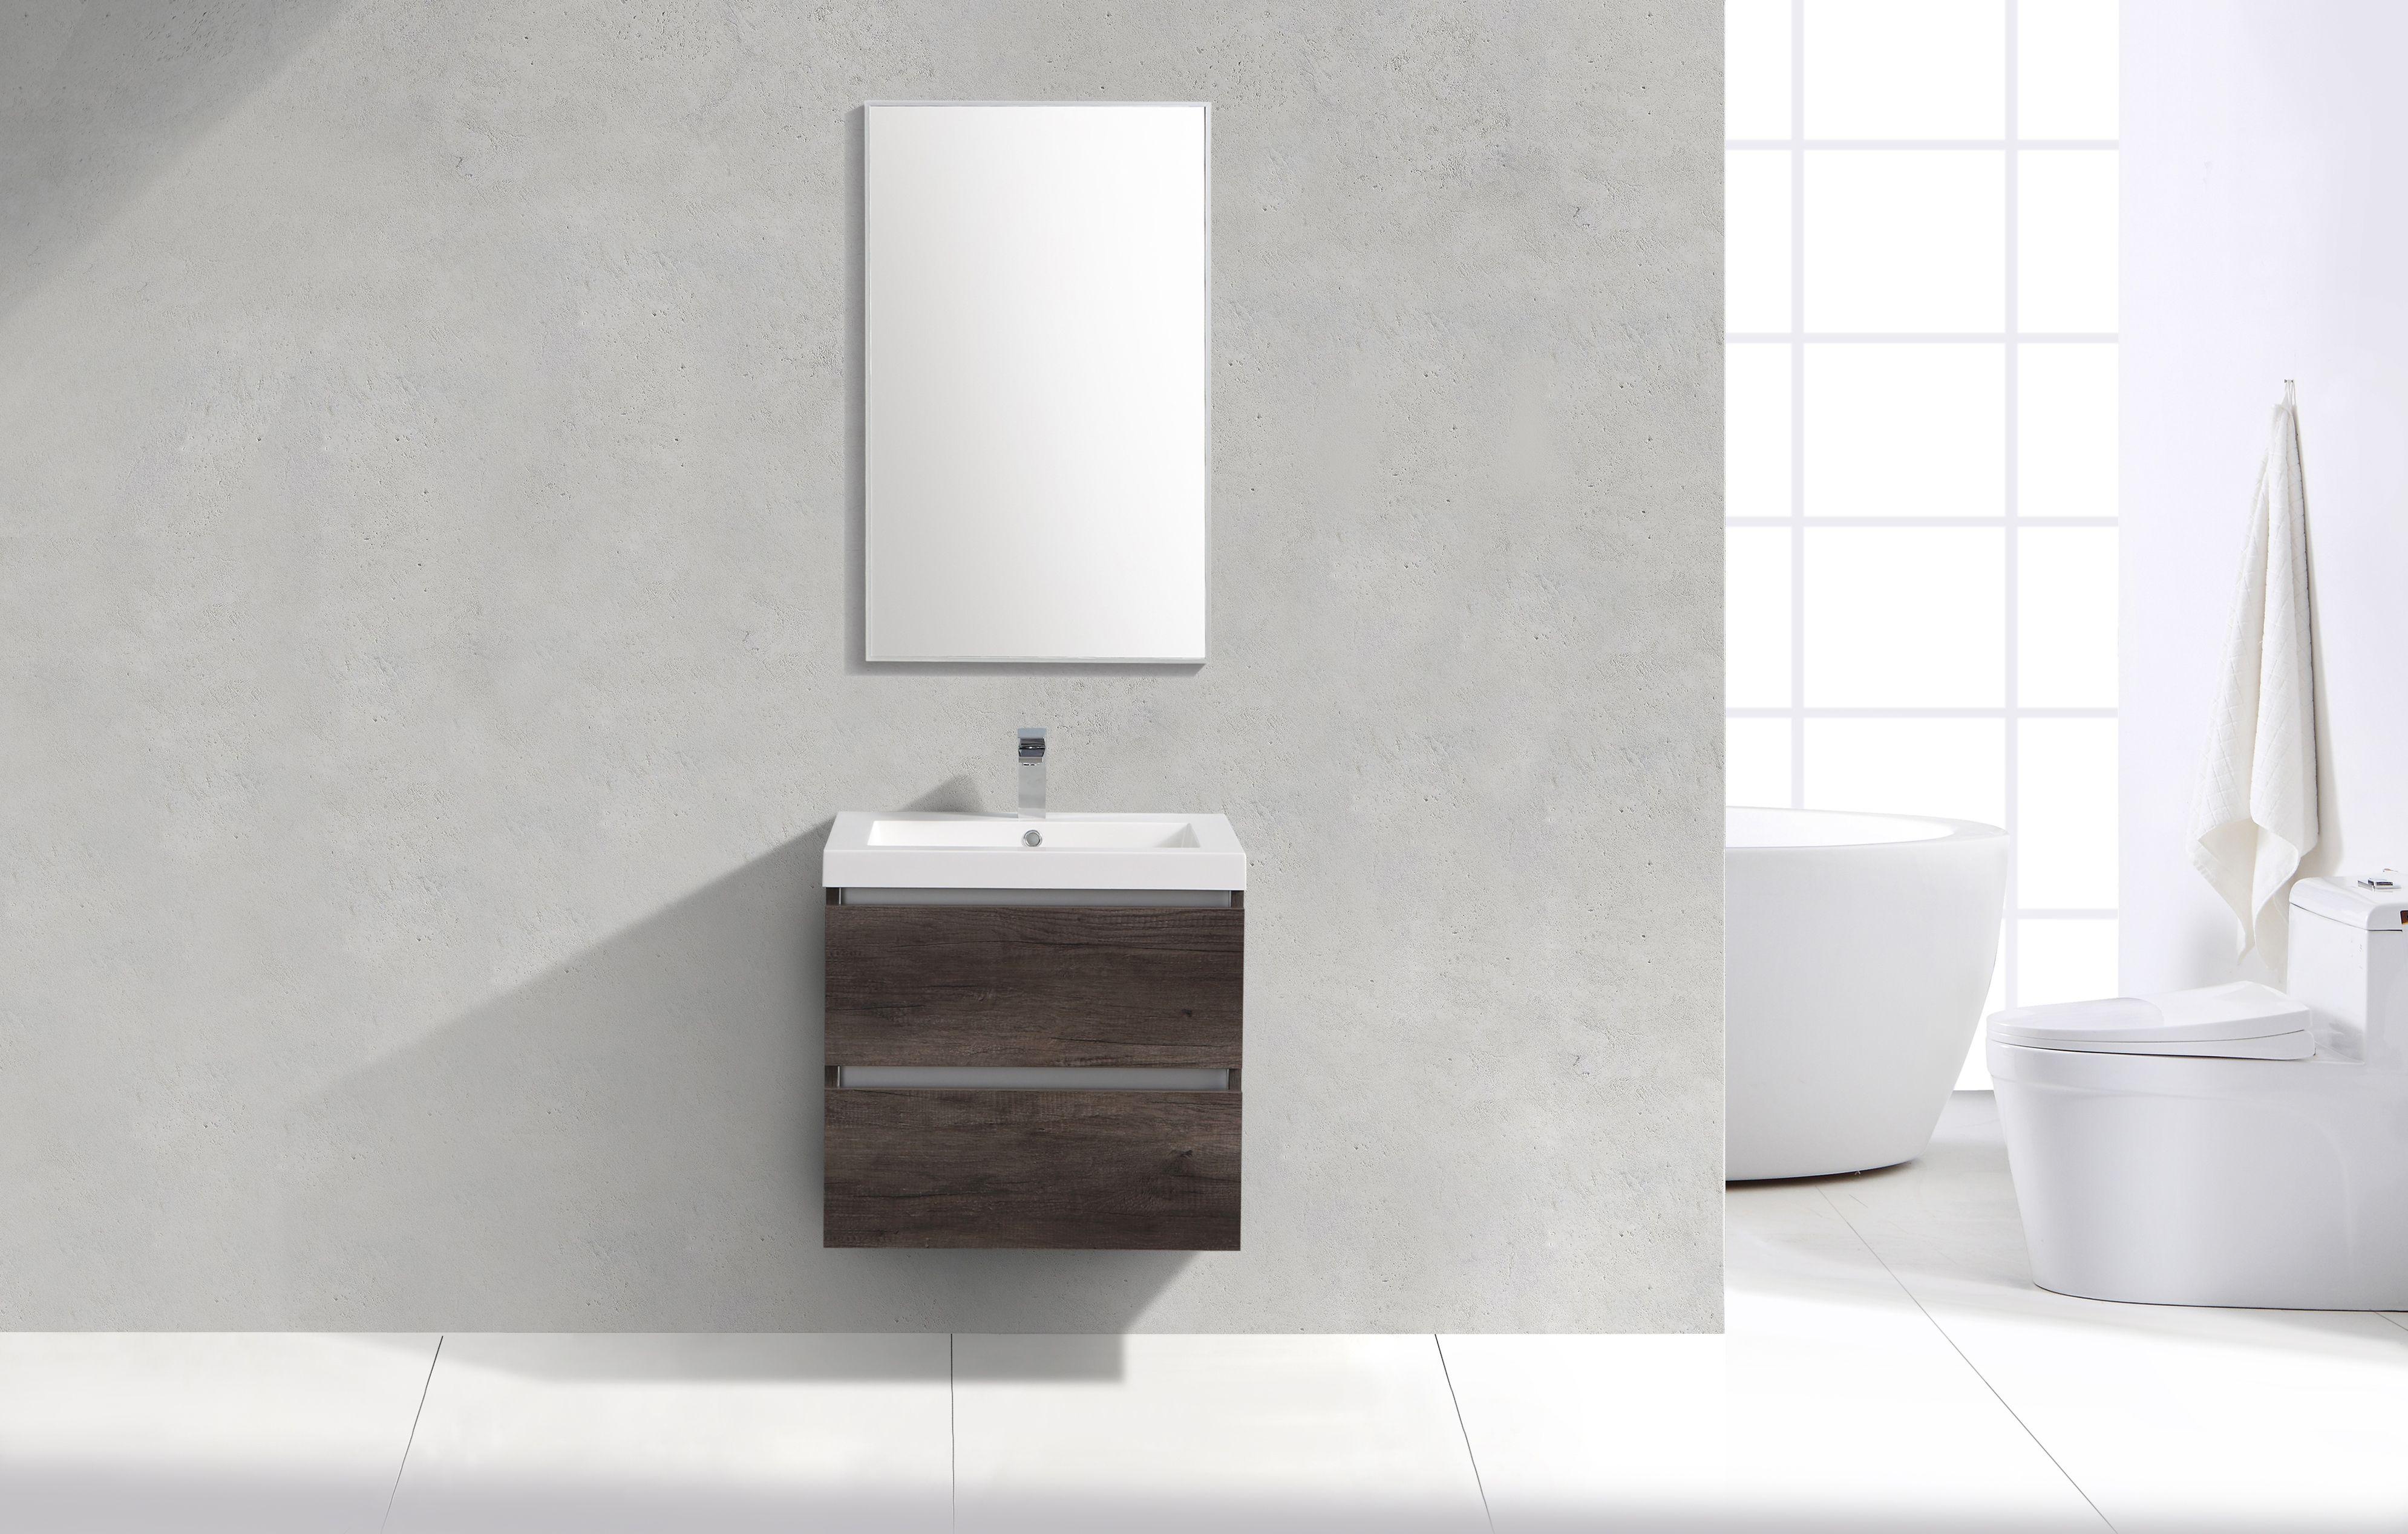 Badkamermeubel alke quadro spiegelkast 100 cm